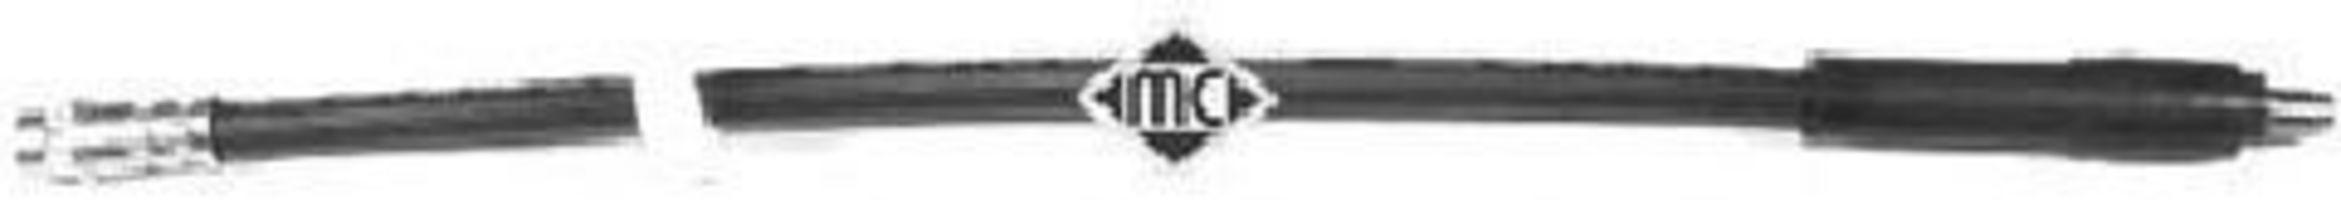 Шланг тормозной METALCAUCHO 96104